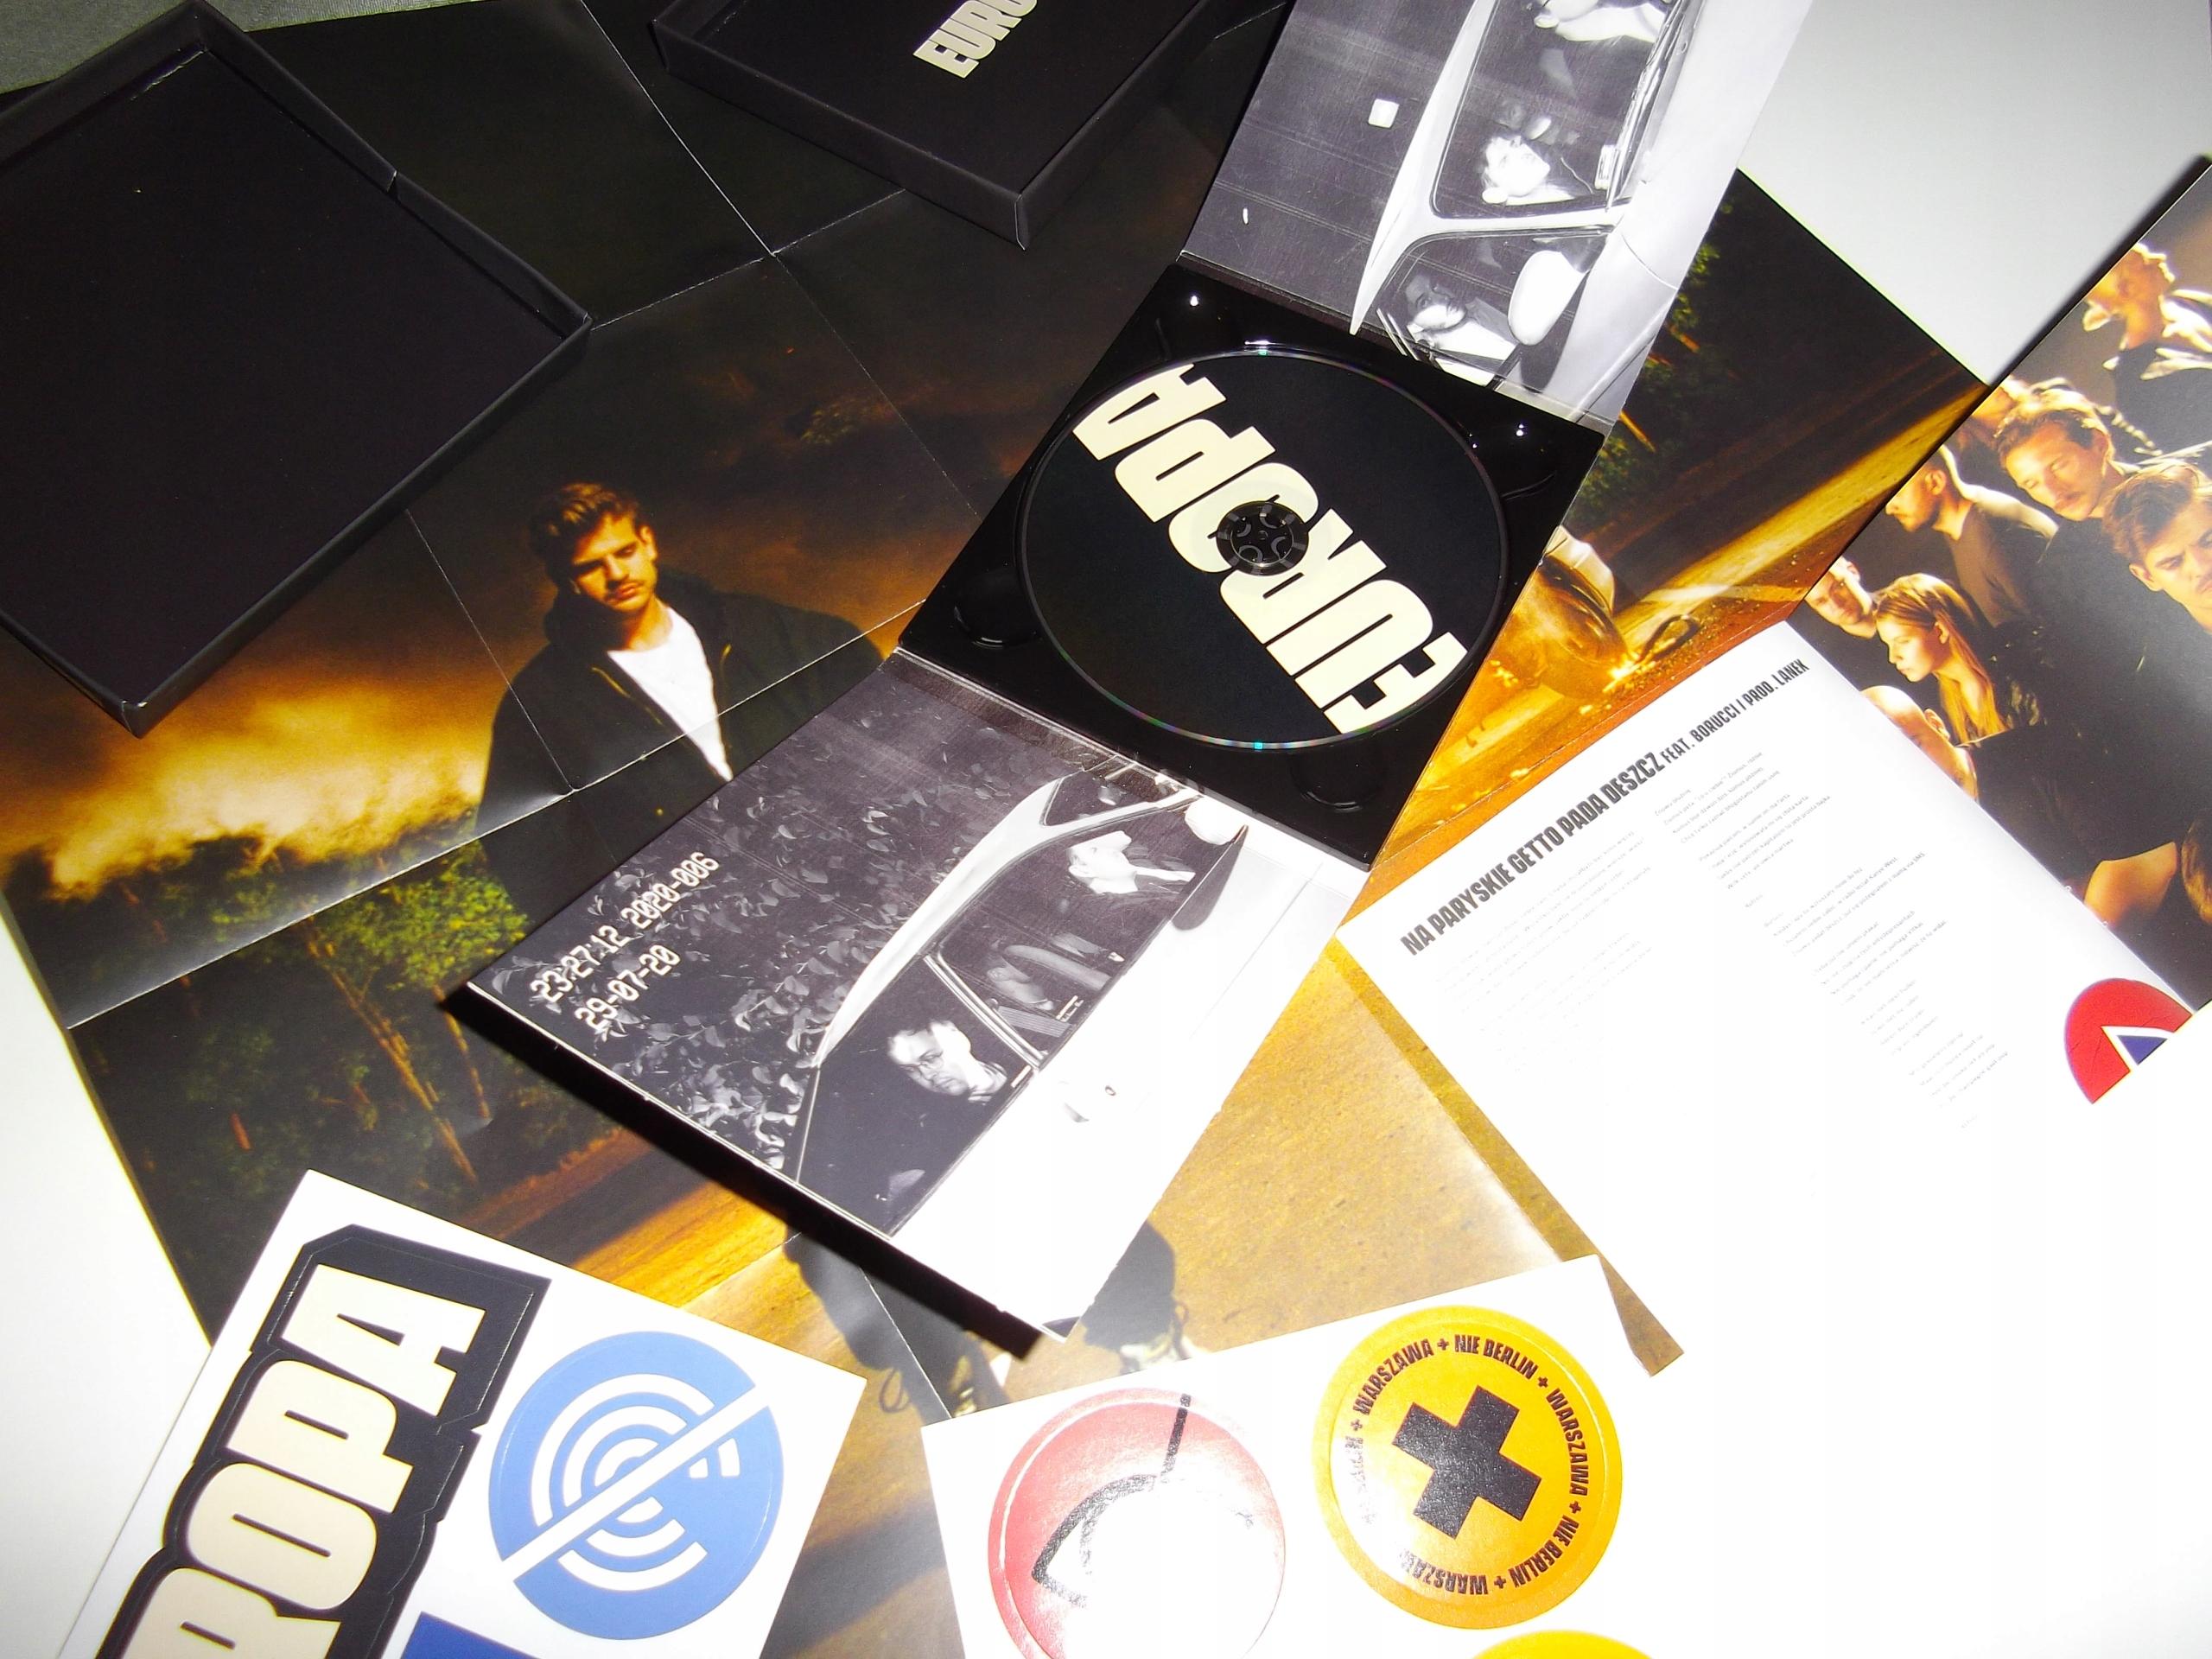 Taco Hemingway Europa Cd Box Limited Plakat Wlepki 9676502667 Allegro Pl